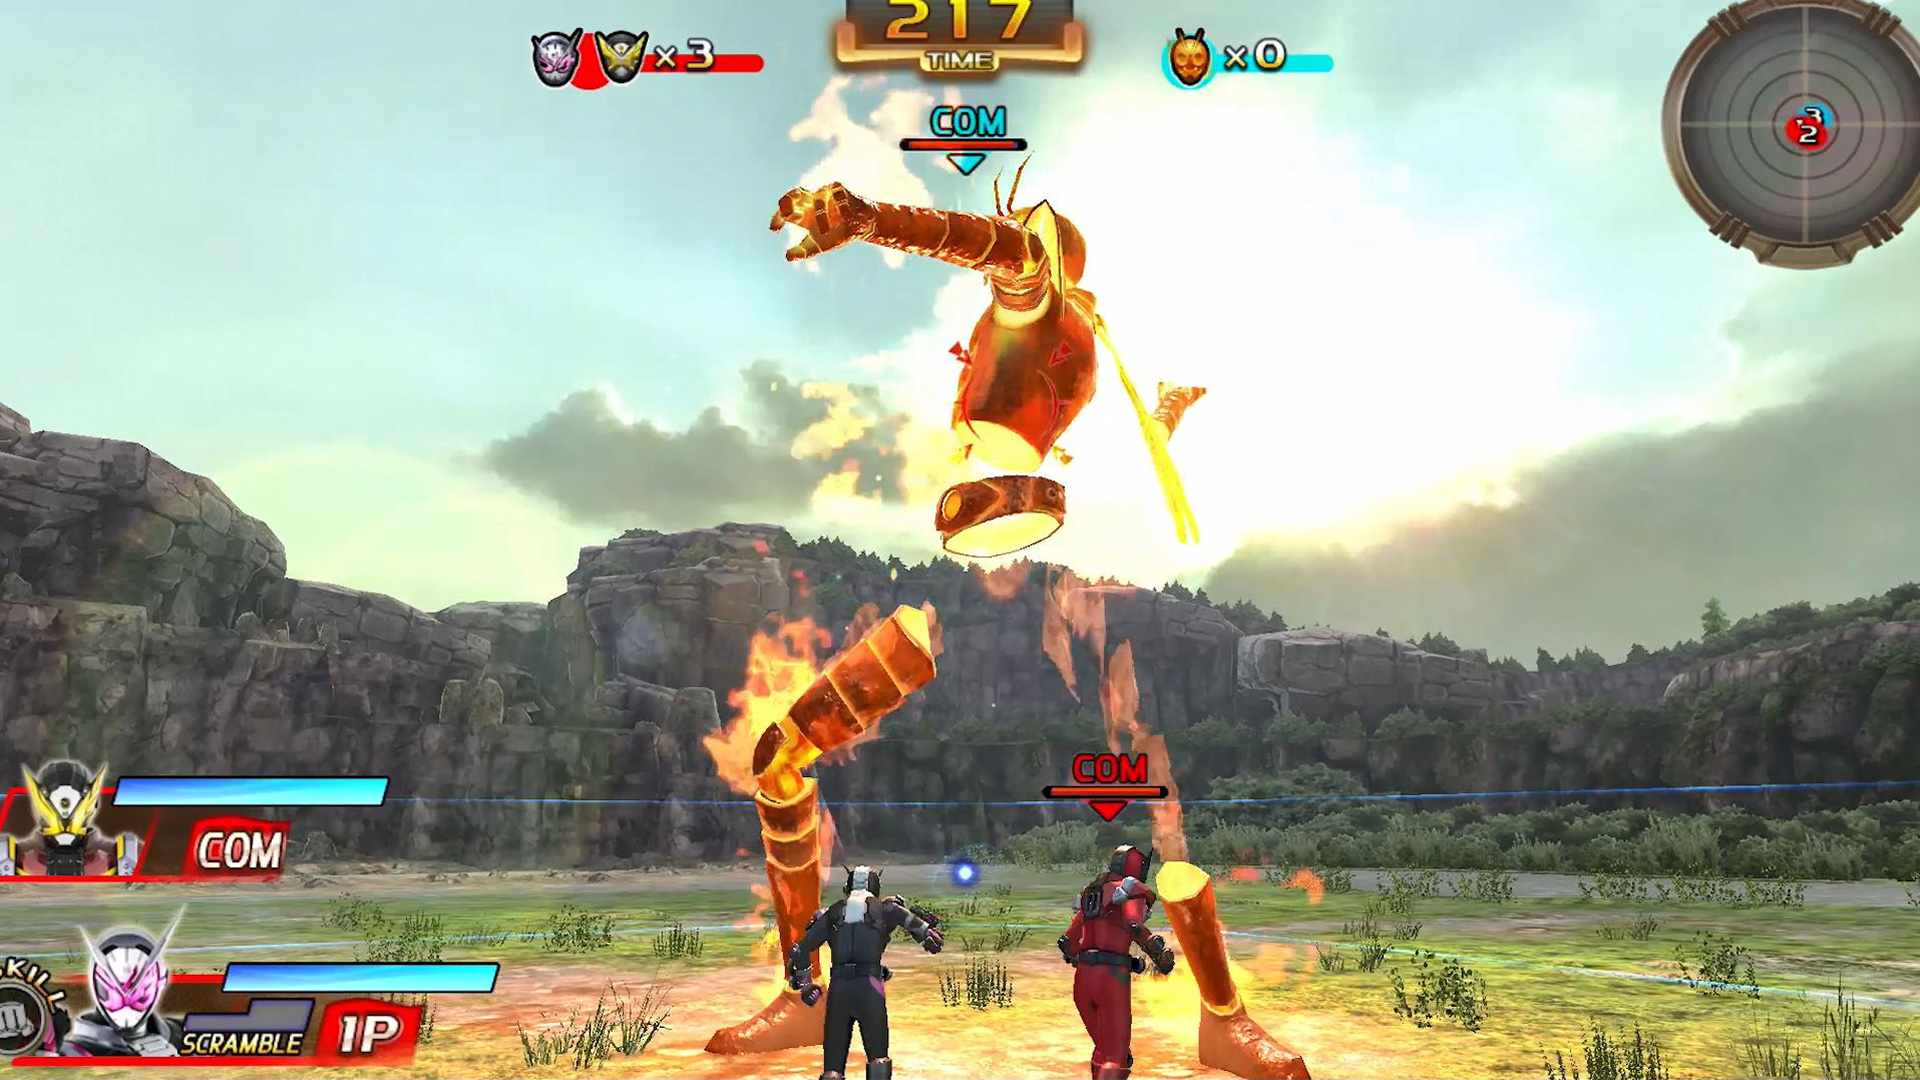 Kamen Rider Climax Scramble - Trailer 01